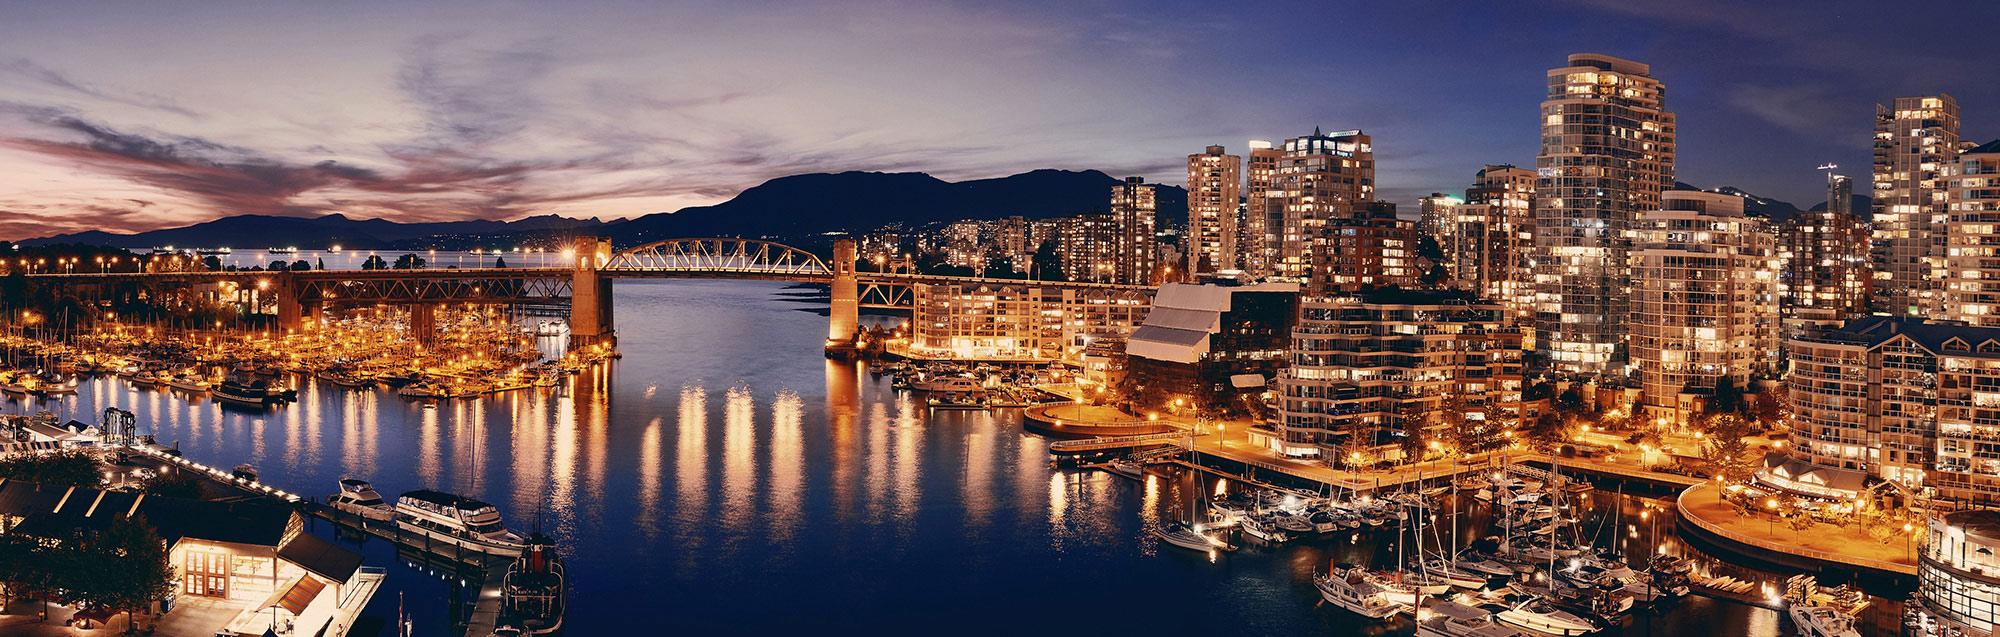 Sprachreise Vancouver